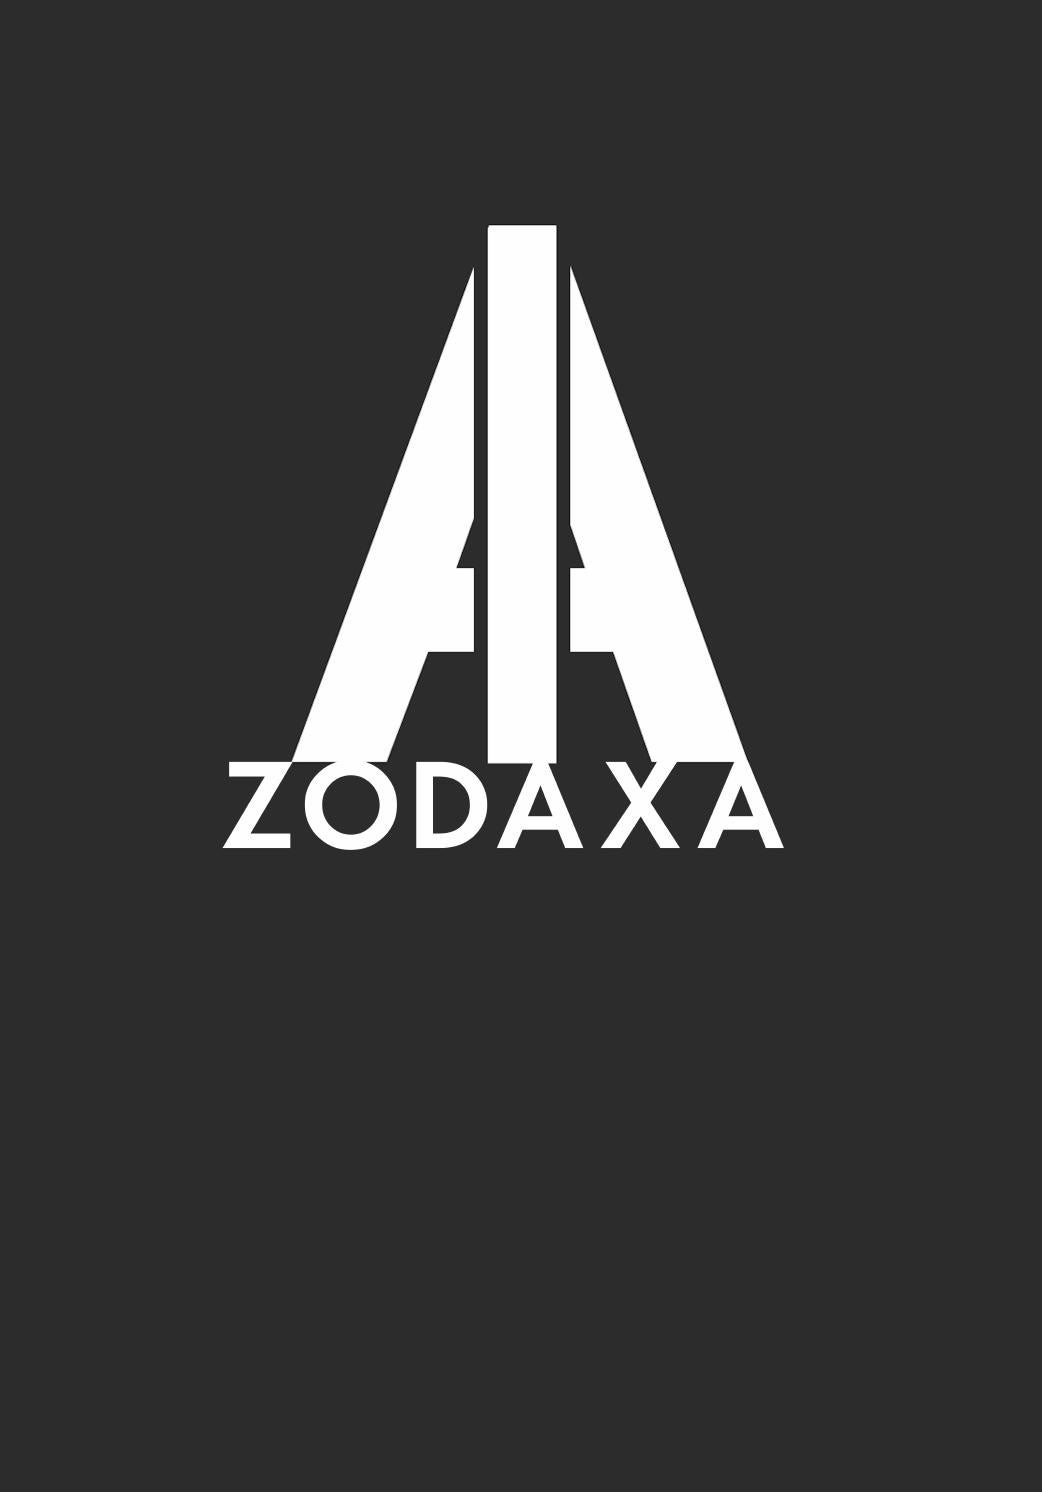 ZODAXA 1 by Ølîvër Tåd - issuu